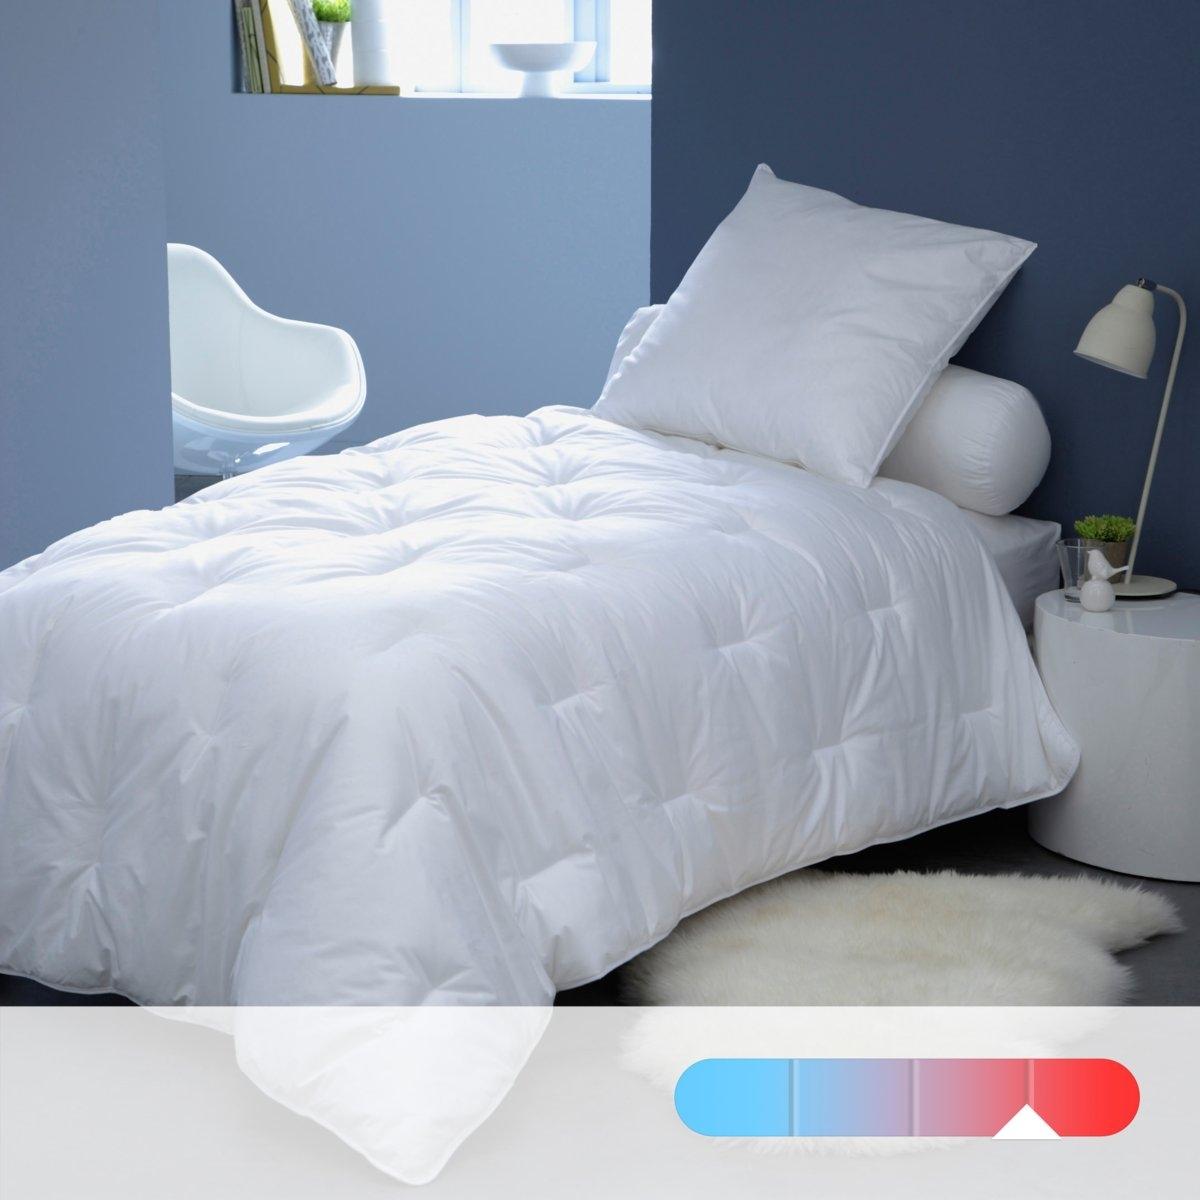 Синтетическое одеяло LESTRA, 450 г/м²